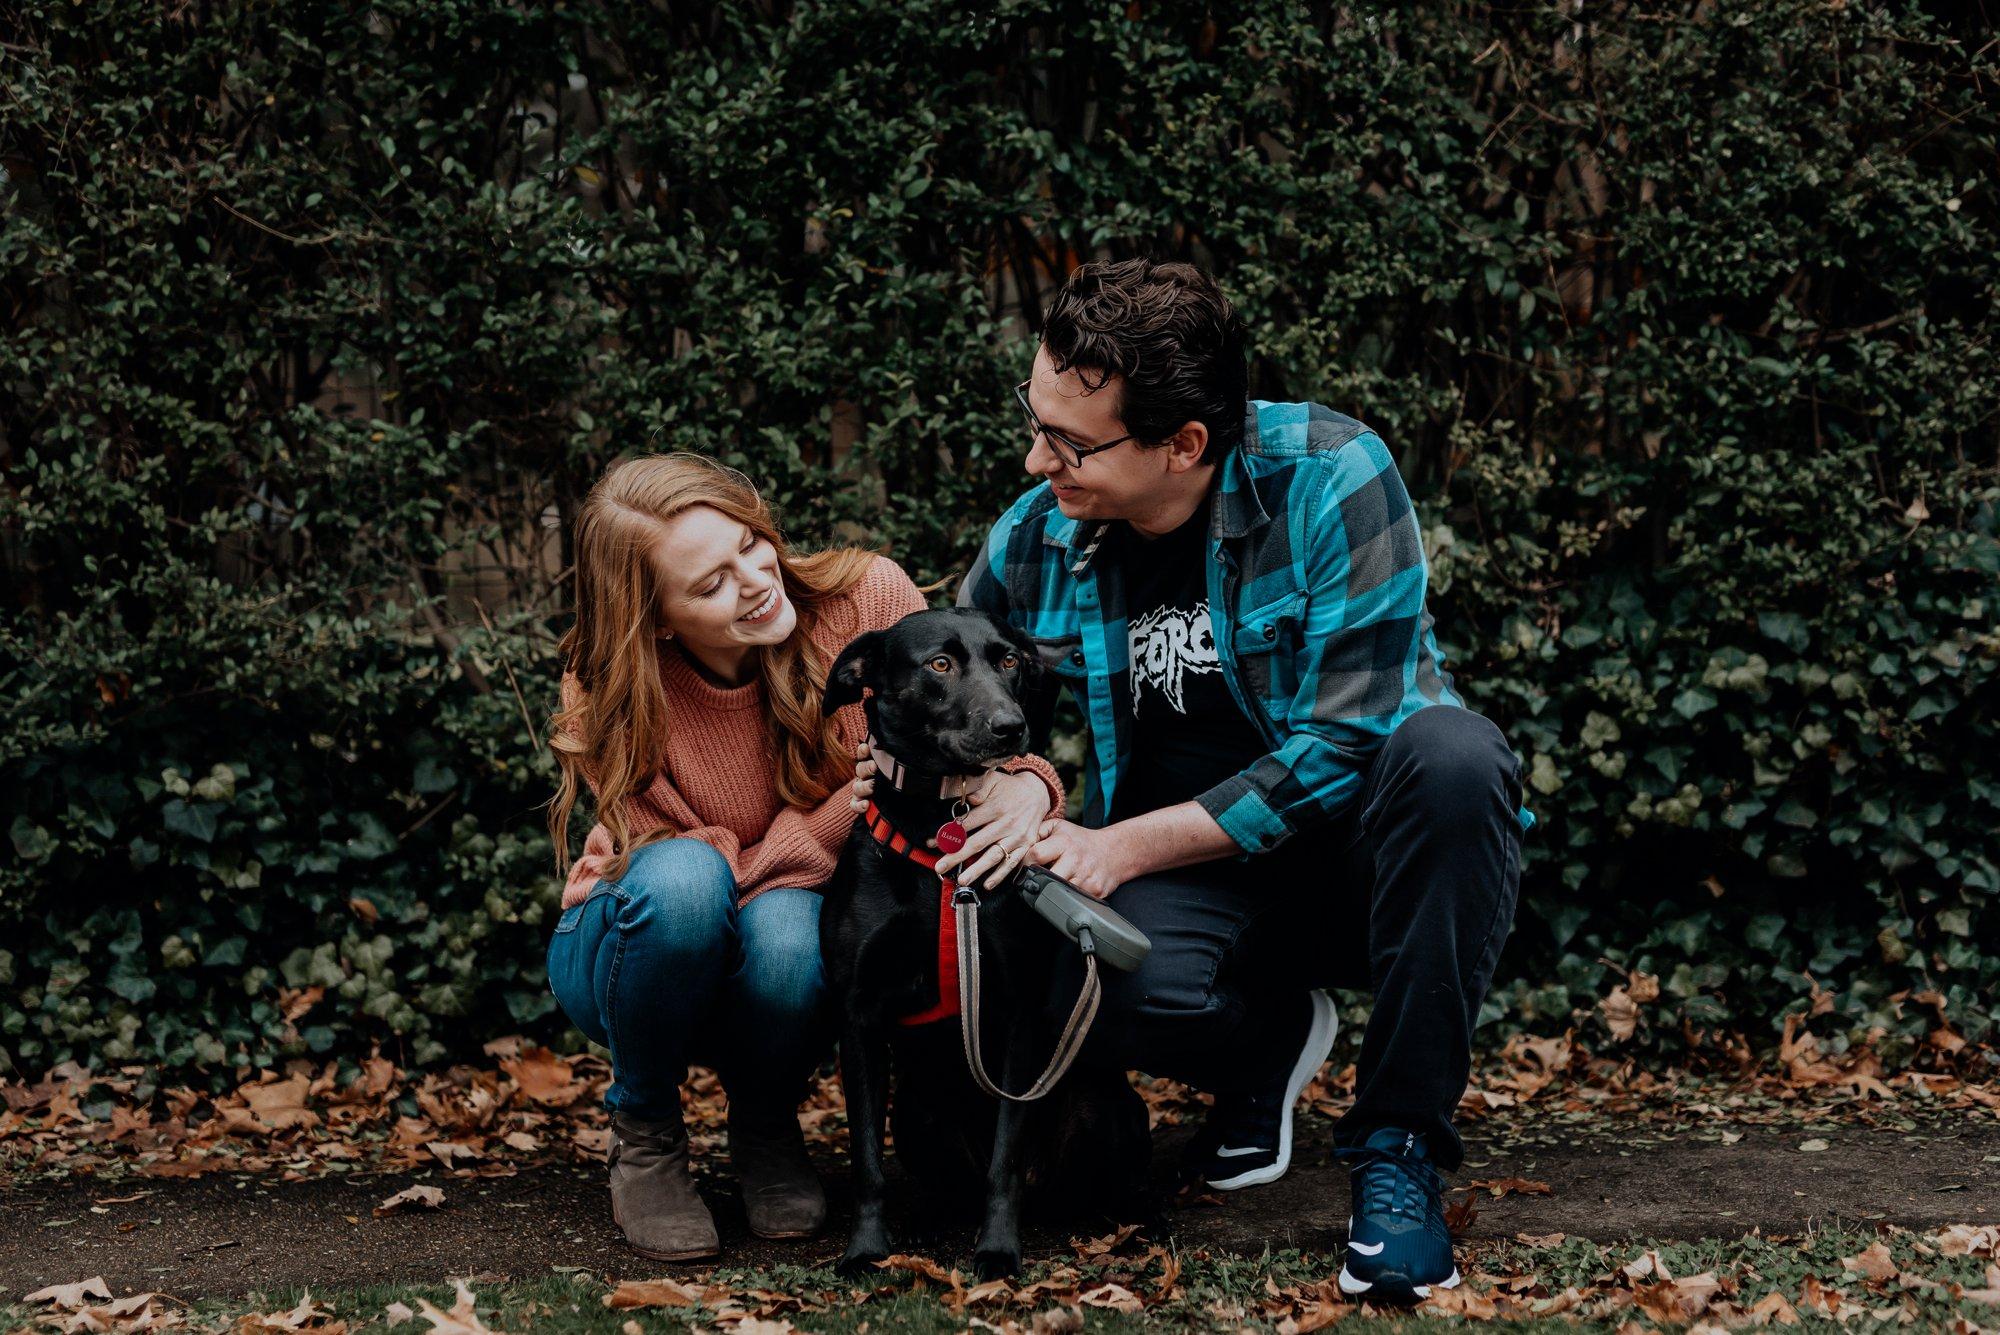 Richmond VA Winter Engagement Session Bellevue Carytown Byrd Park Flit Photography Wedding Photographer